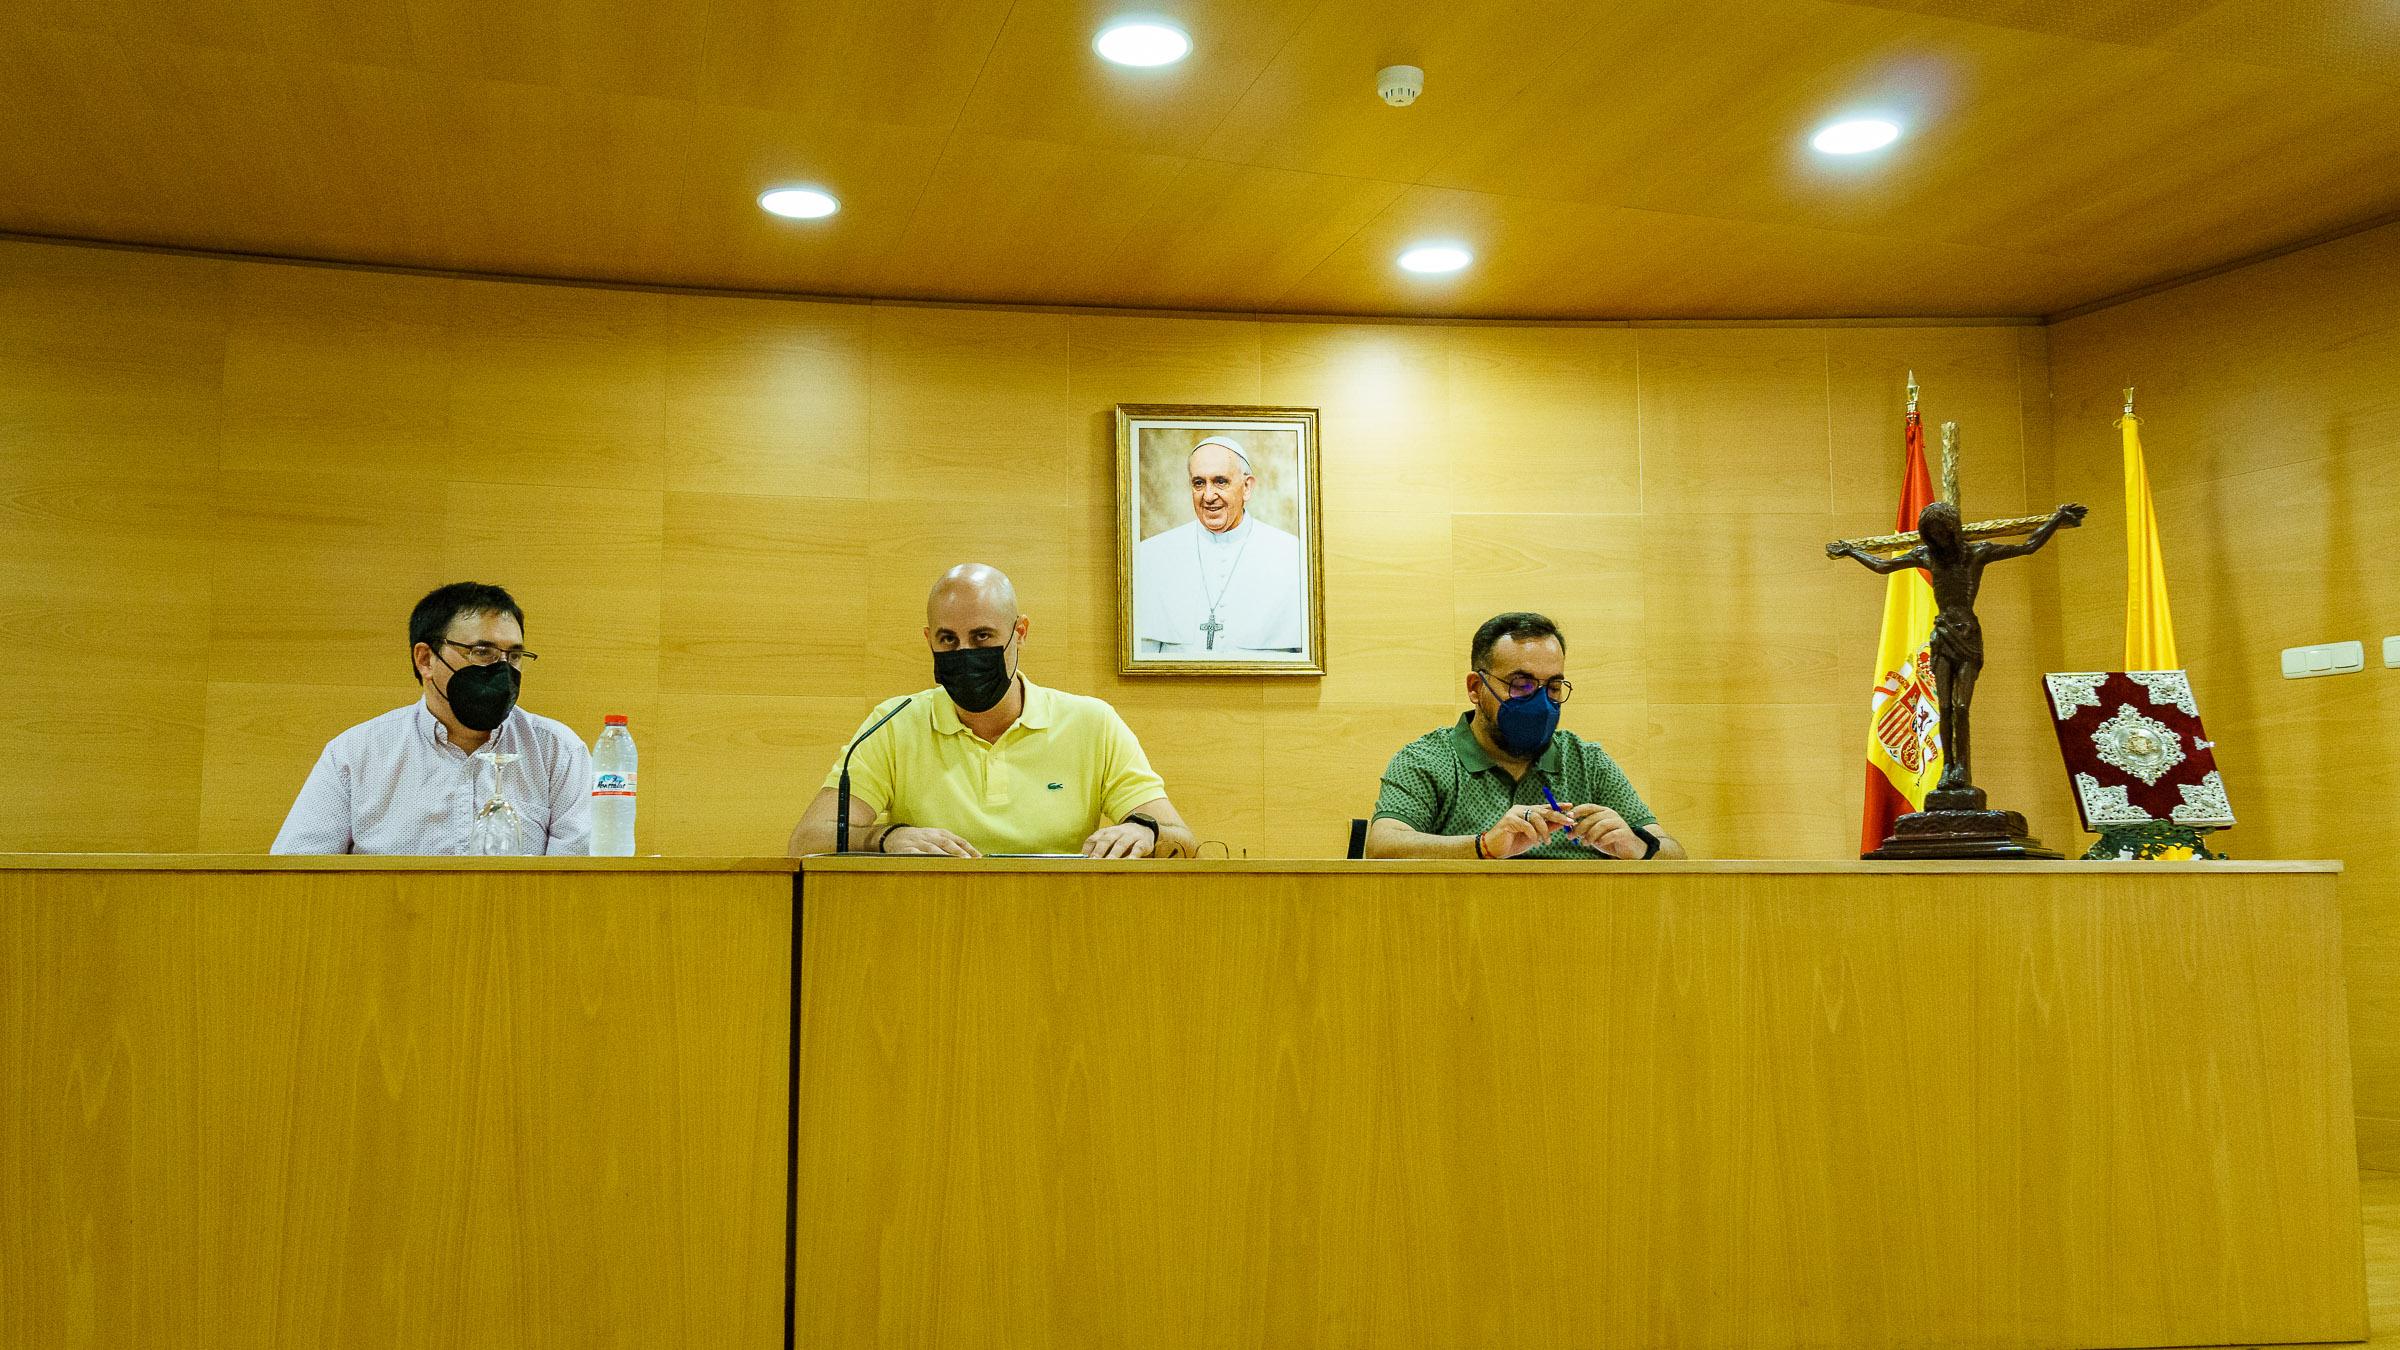 Asamblea Santa Cena. 10.07.21_DSC3494